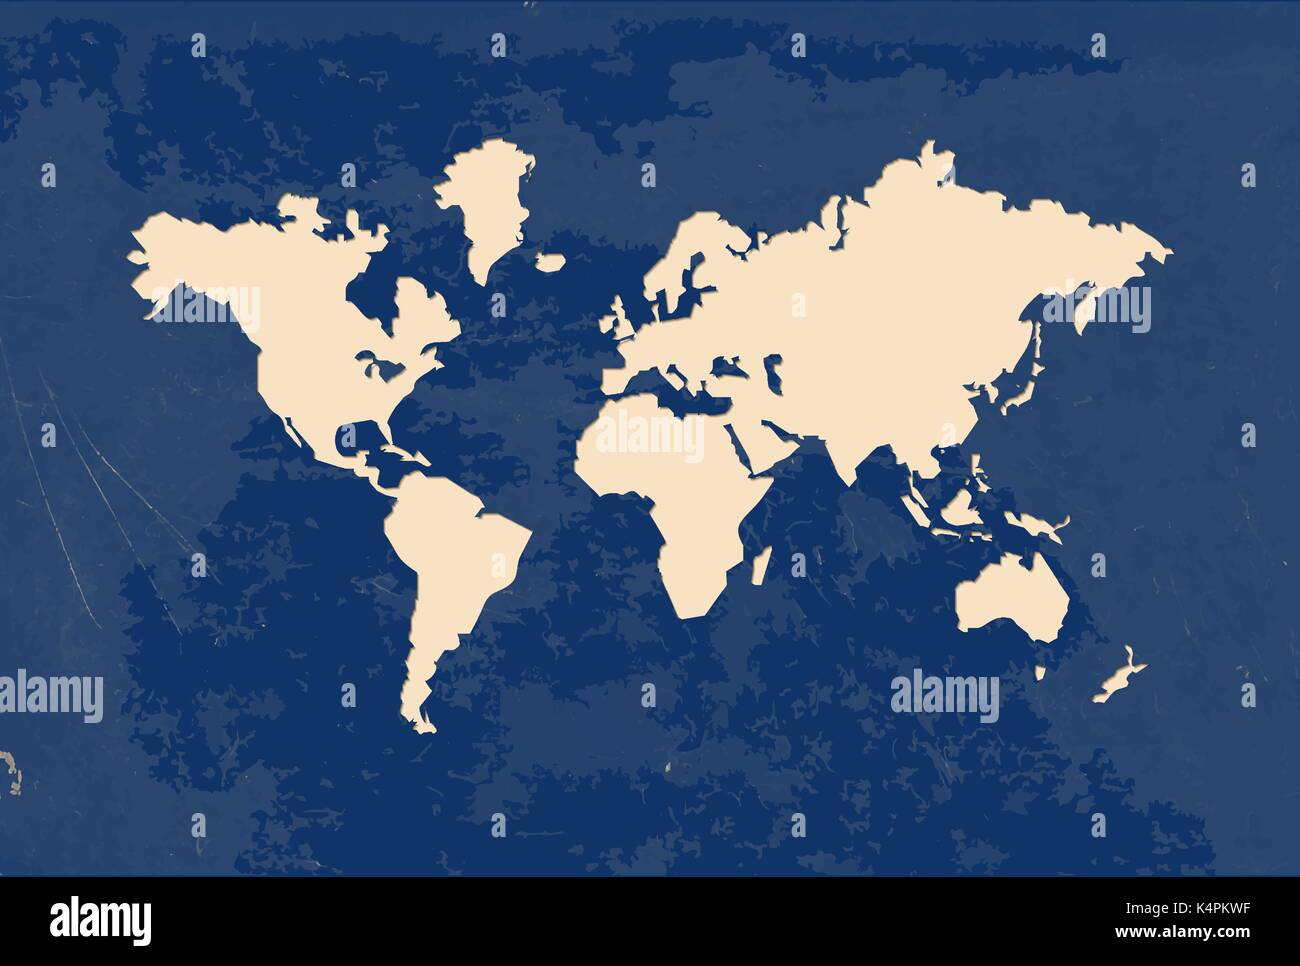 World Map Shape Illustration Template In Modern Paper Cut Art - World map shape